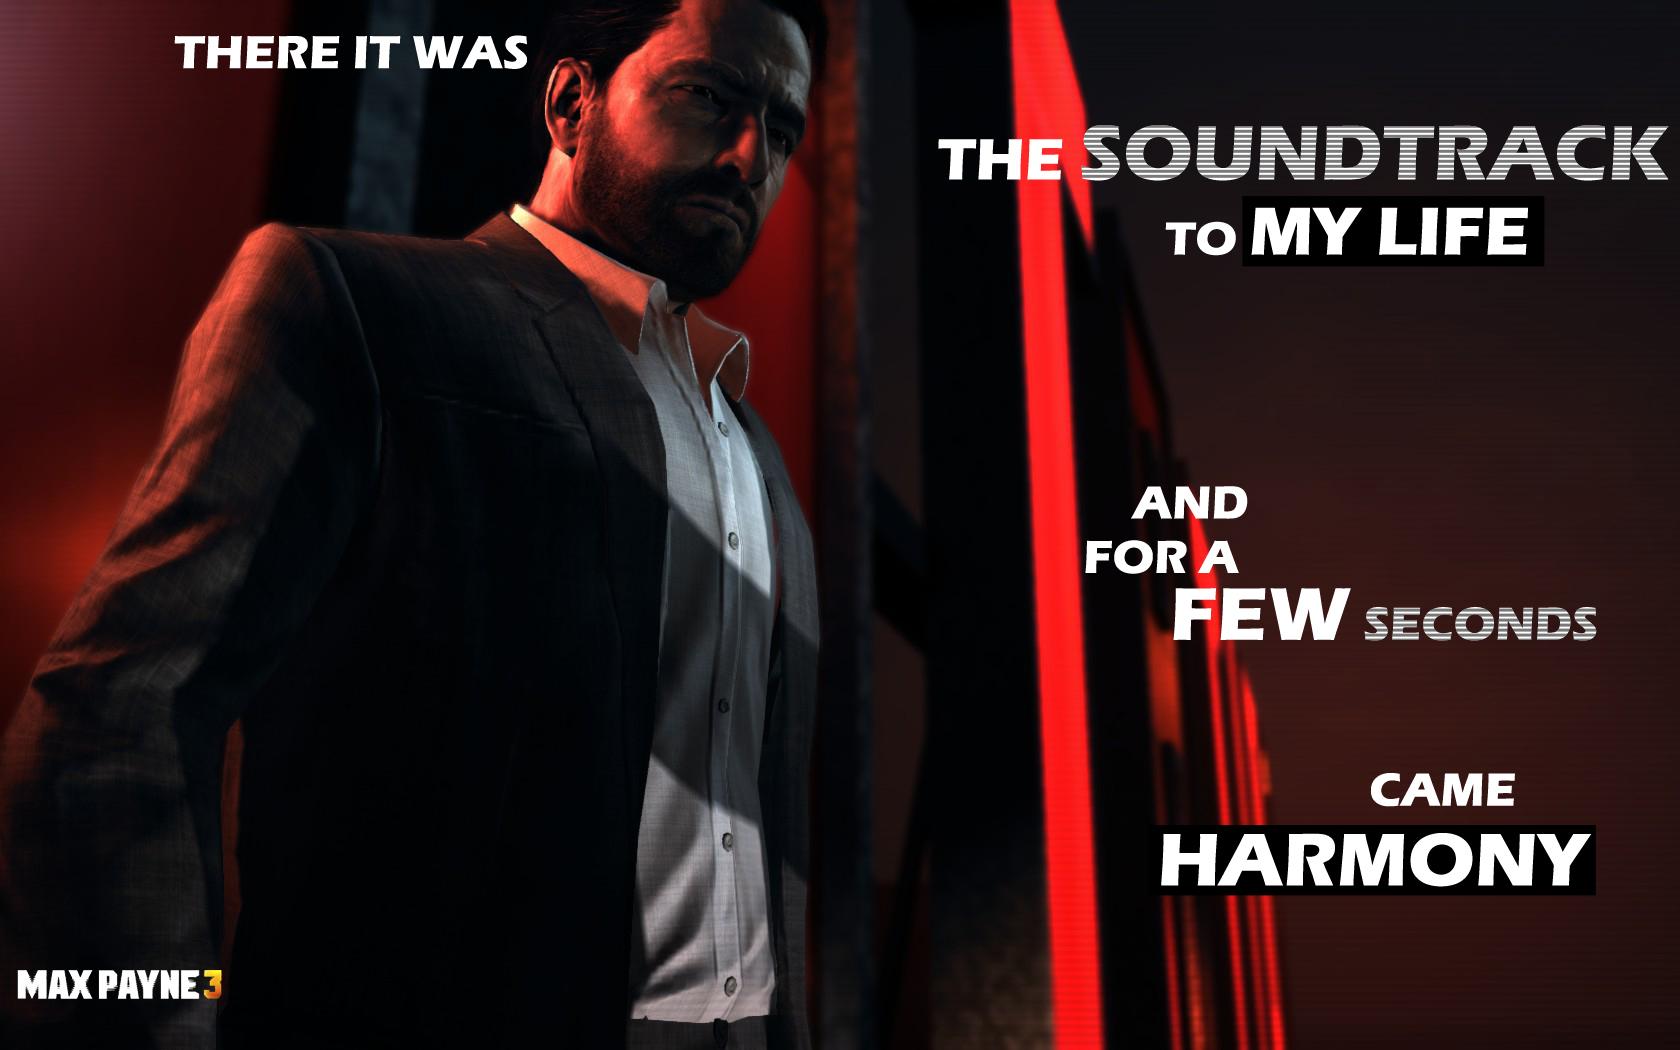 Great Wallpaper Movie Max Payne - max_payne_3_wallpaper___harmony_by_insanedictator-d7yefgx  2018_682886.jpg